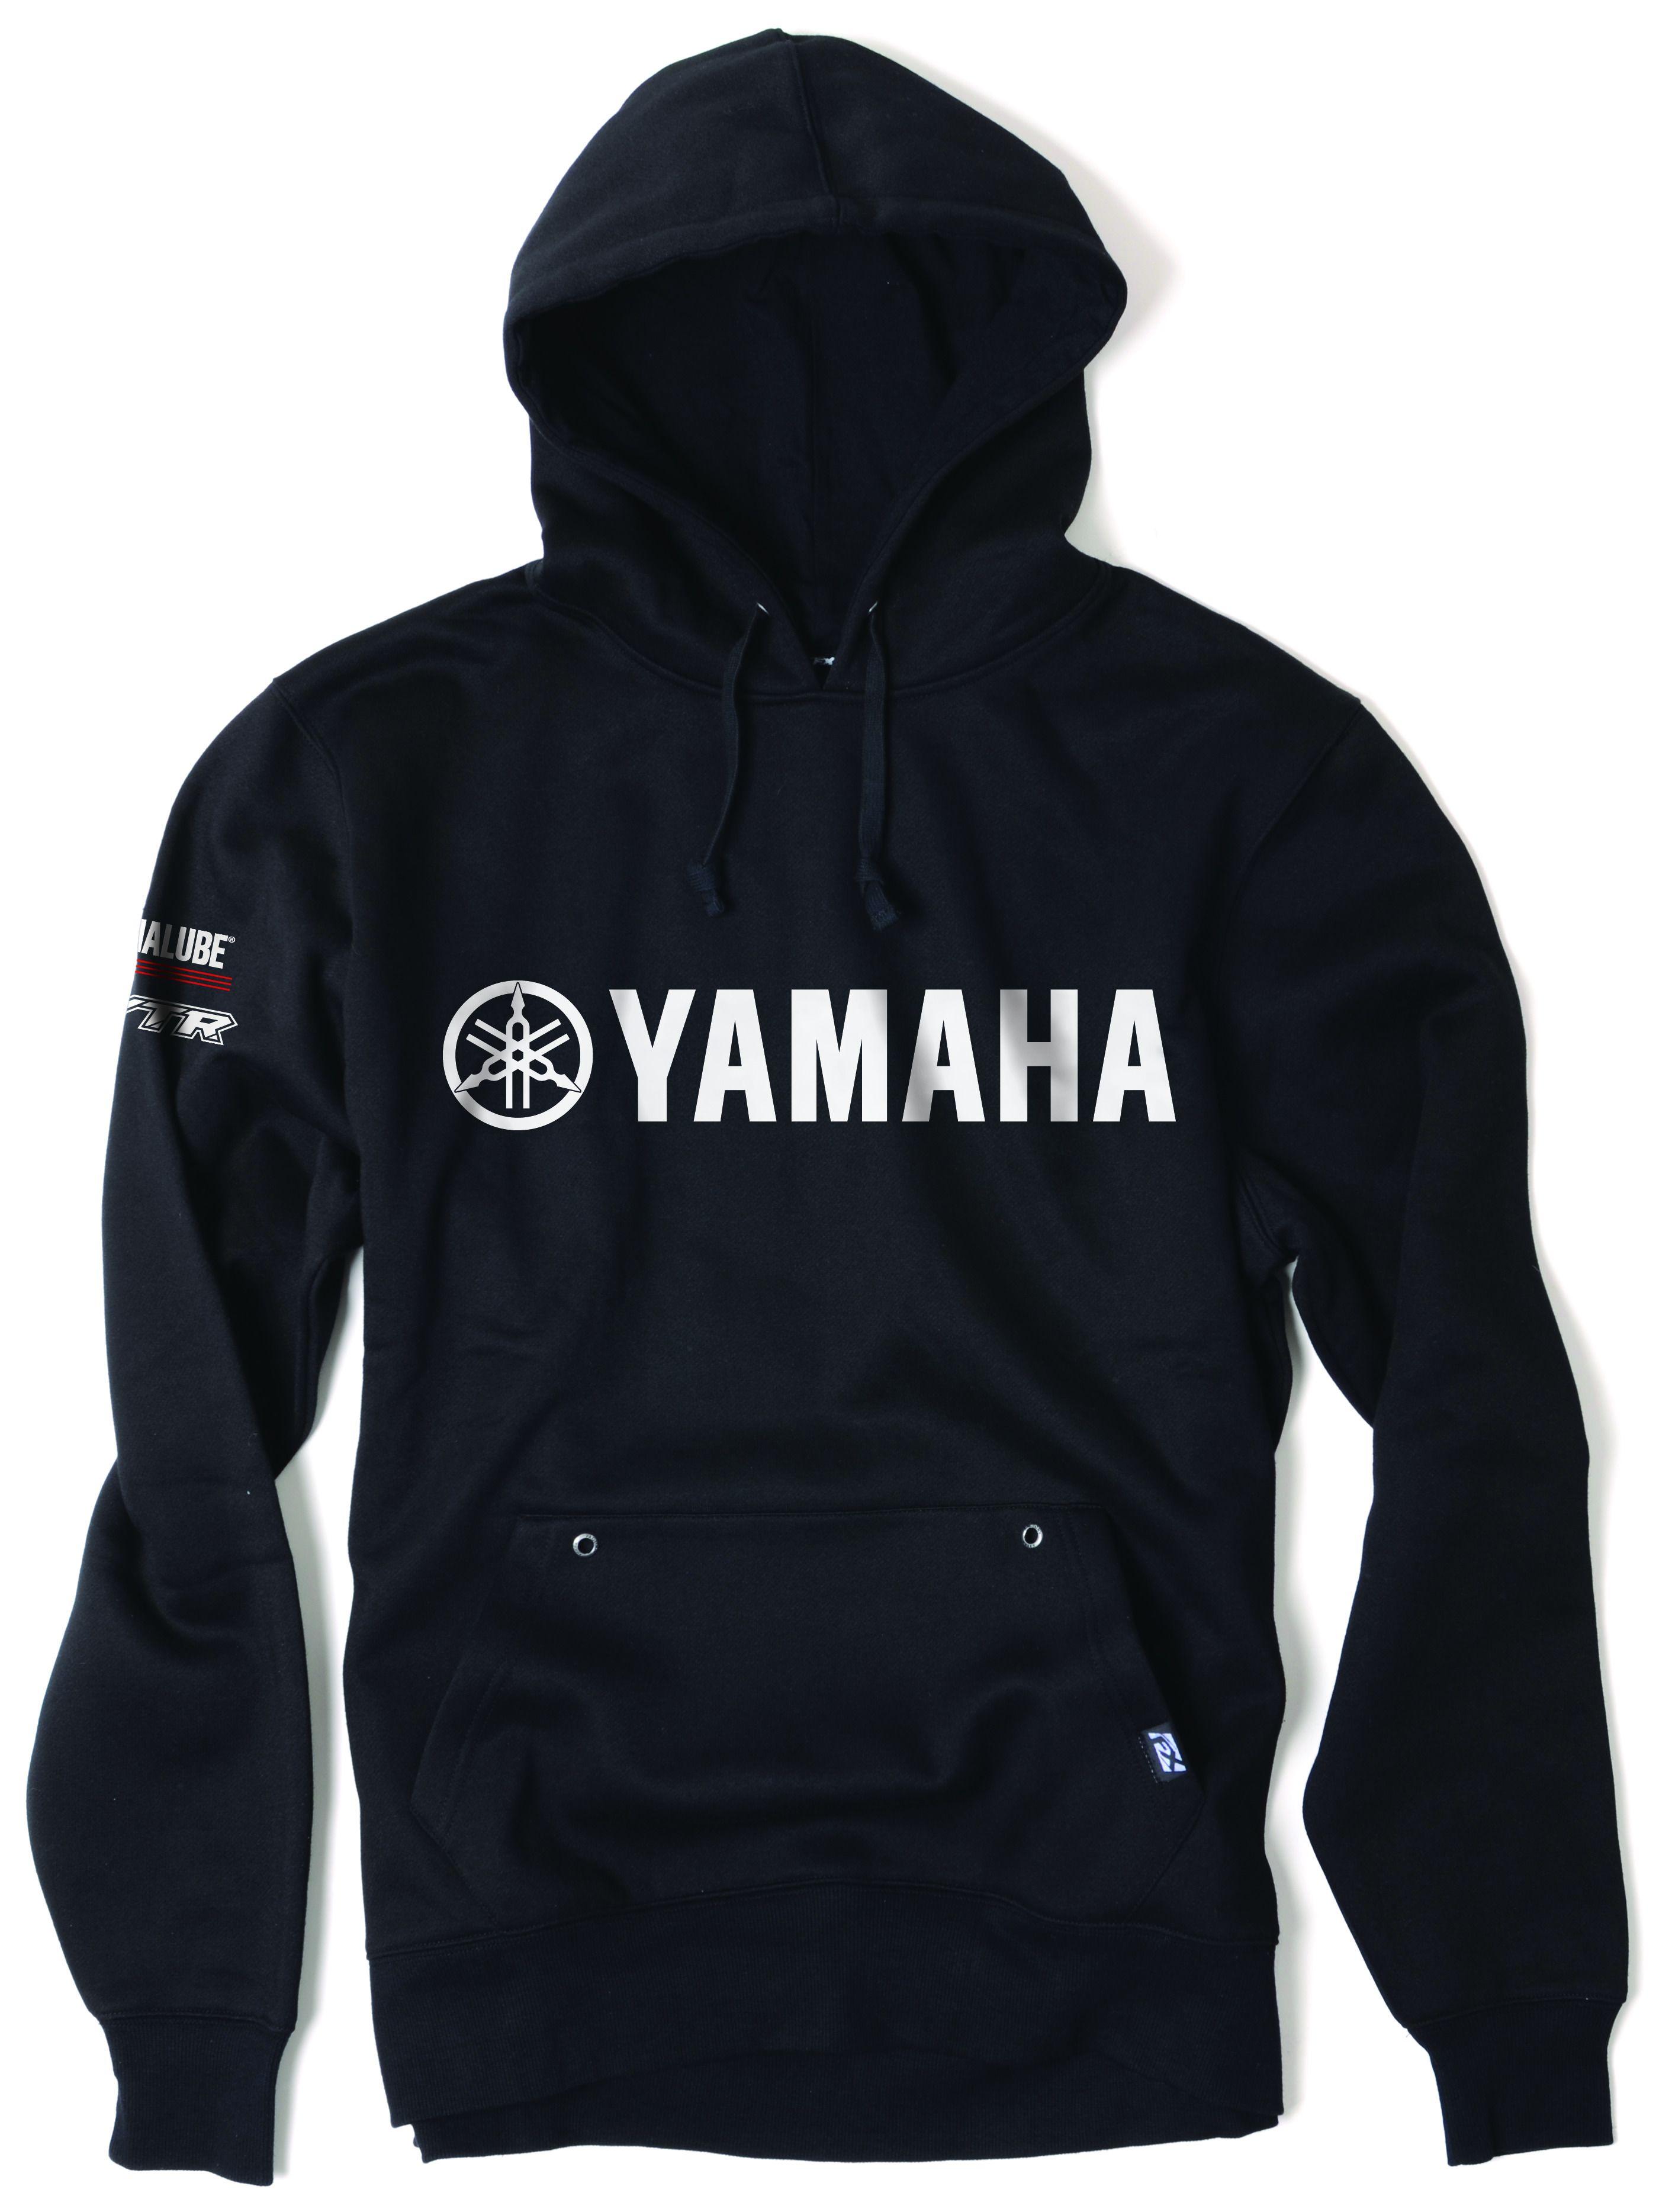 Yamaha Racing Jacket Philippines